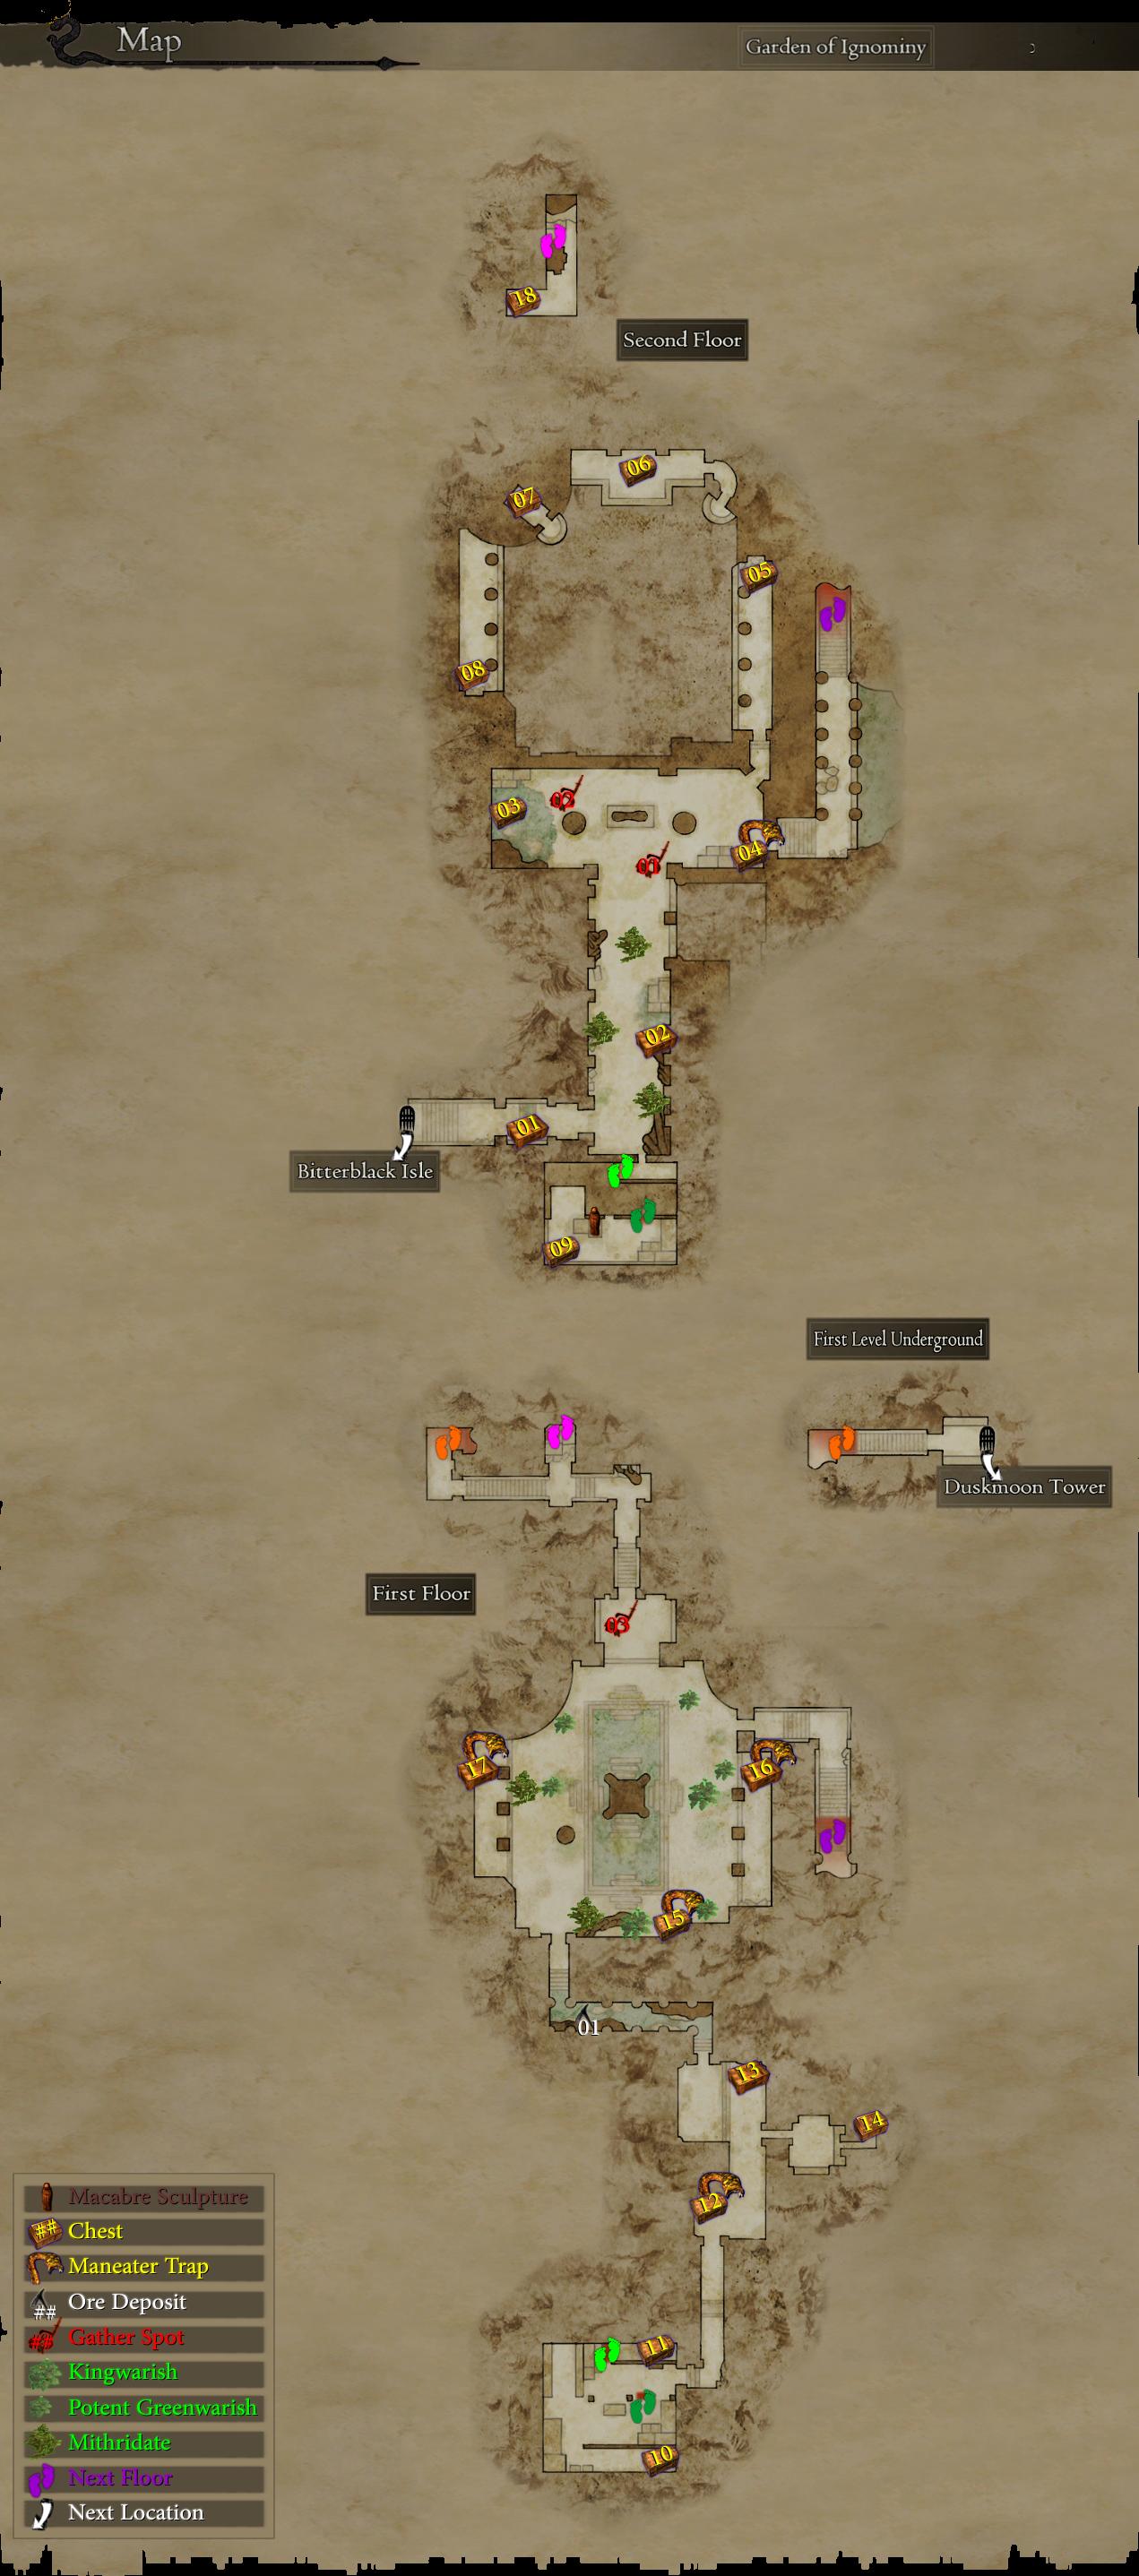 List of Garden of Ignominy Loot (Pre-Daimon) | Dragon's Dogma Wiki Dragon Dogma Full Map on